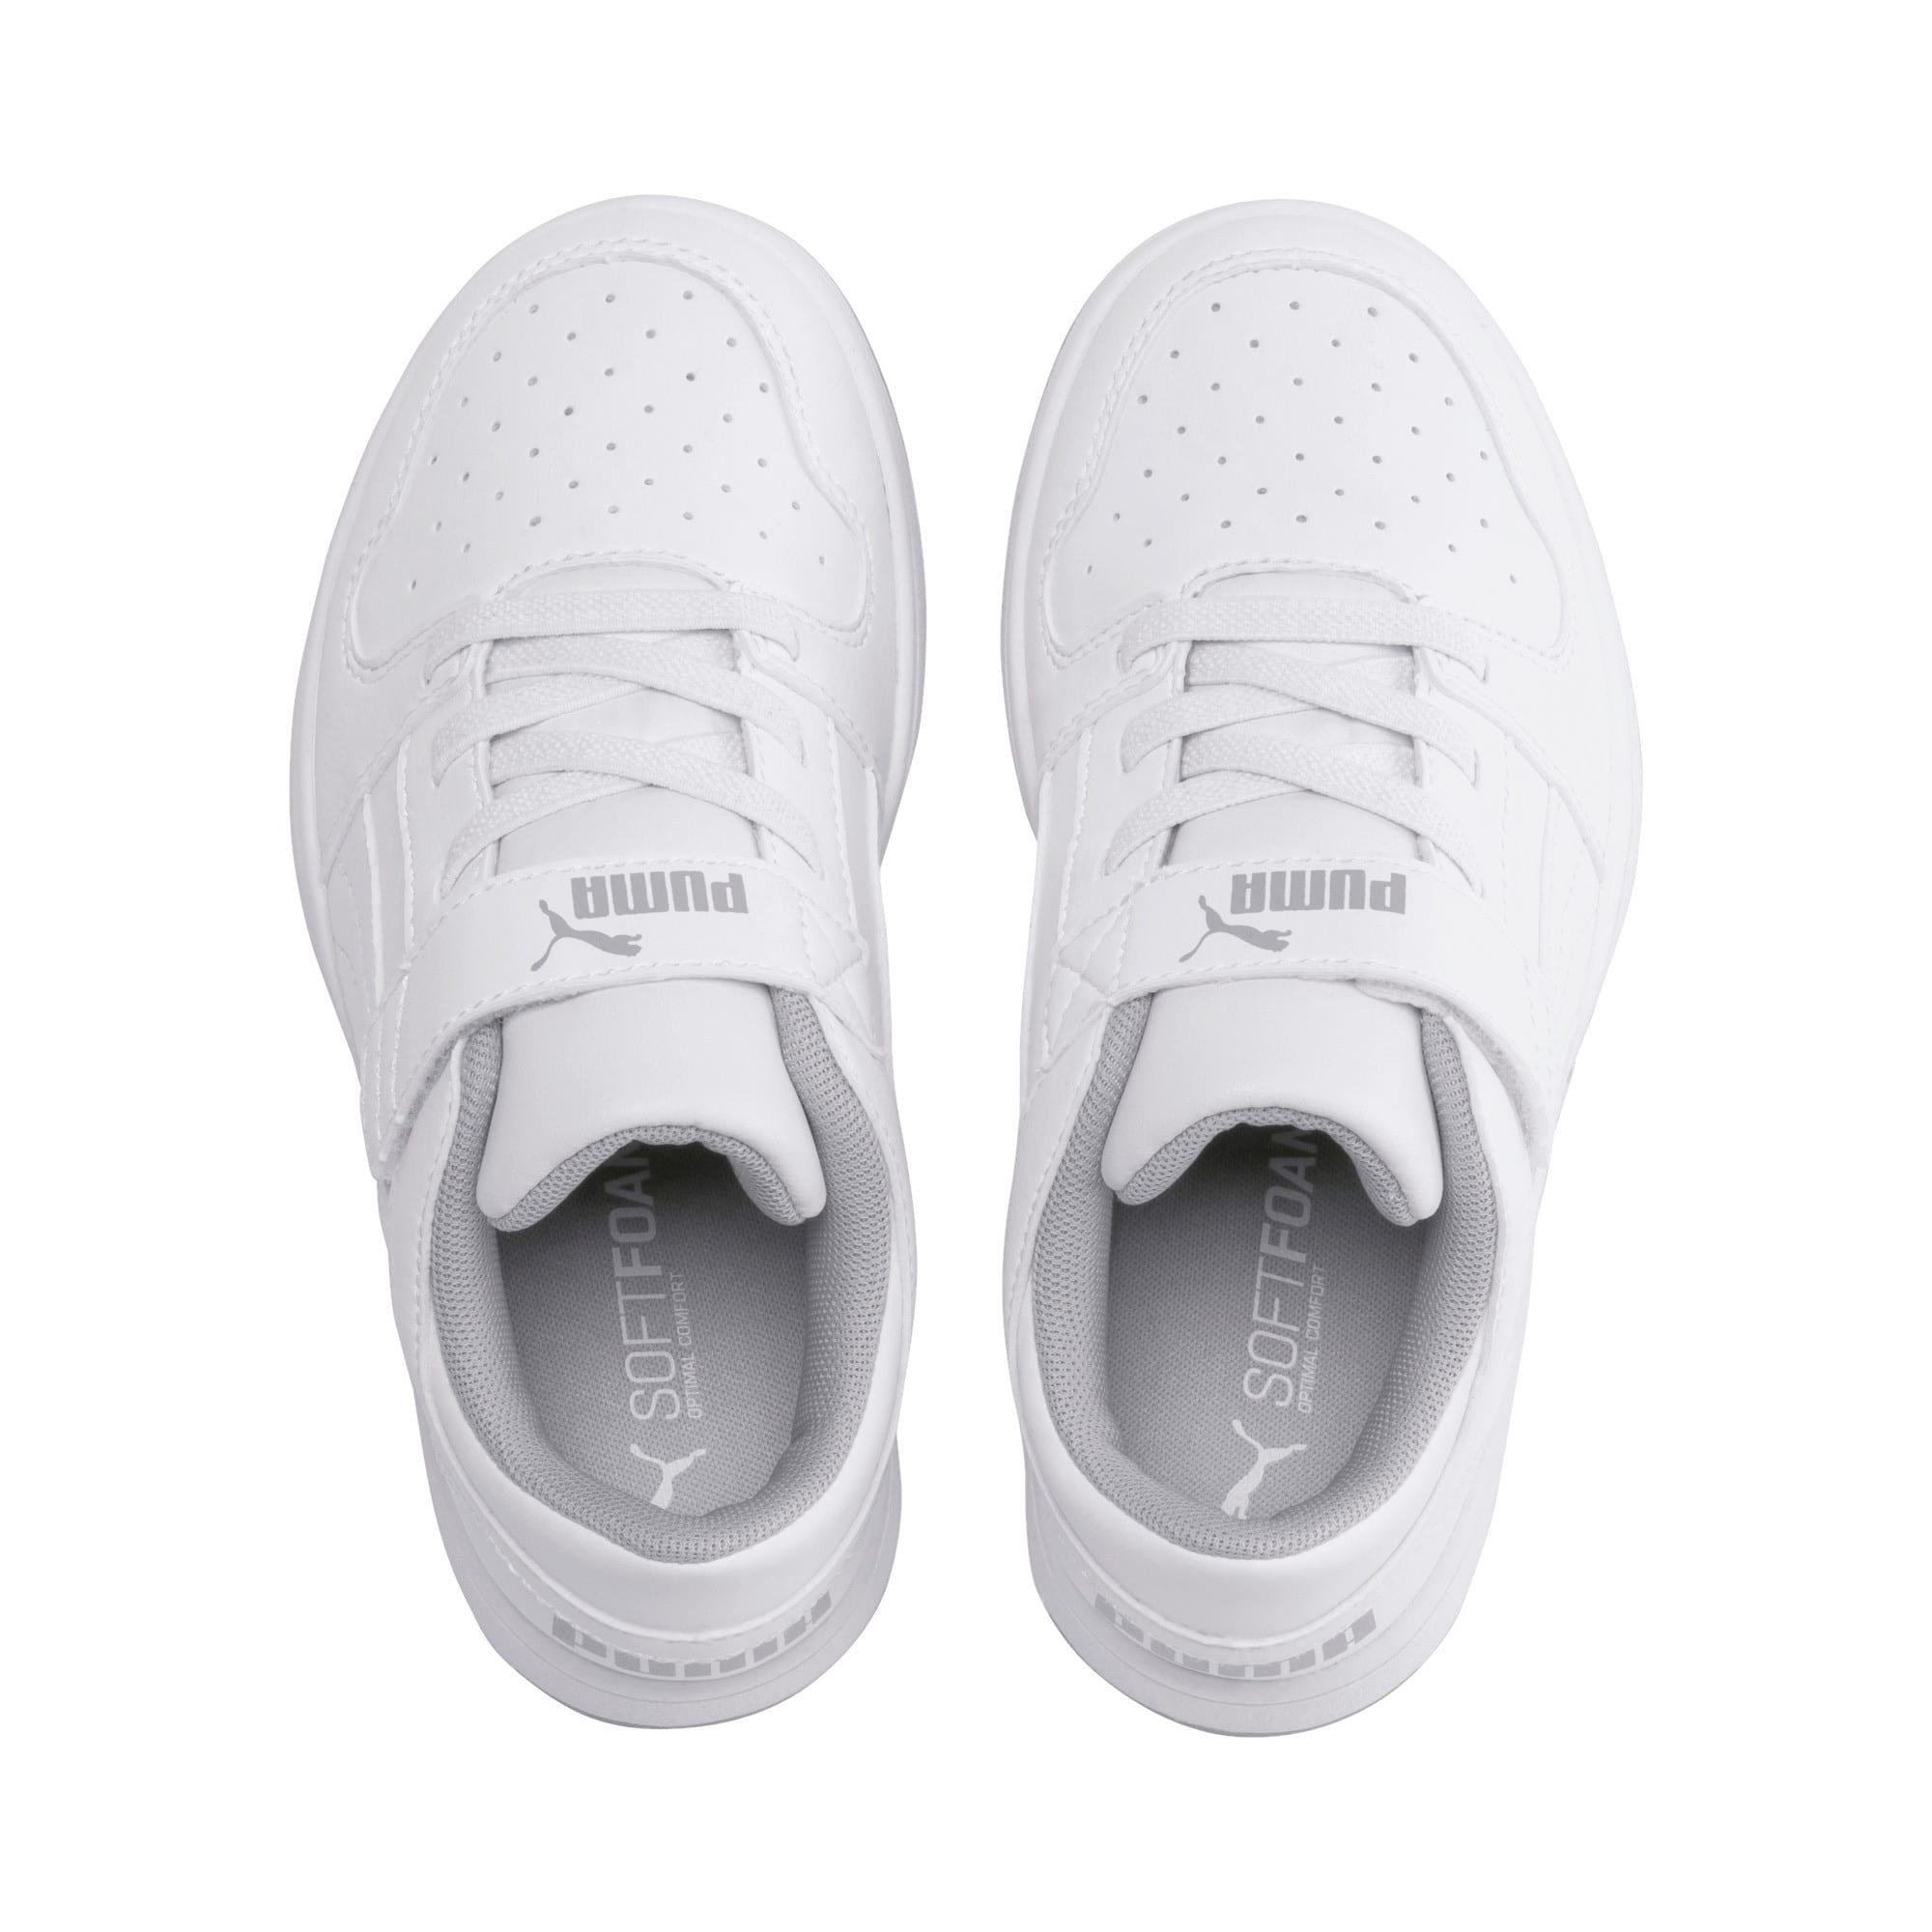 Thumbnail 6 of PUMA Rebound LayUp Lo Little Kids' Shoes, Puma White-High Rise, medium